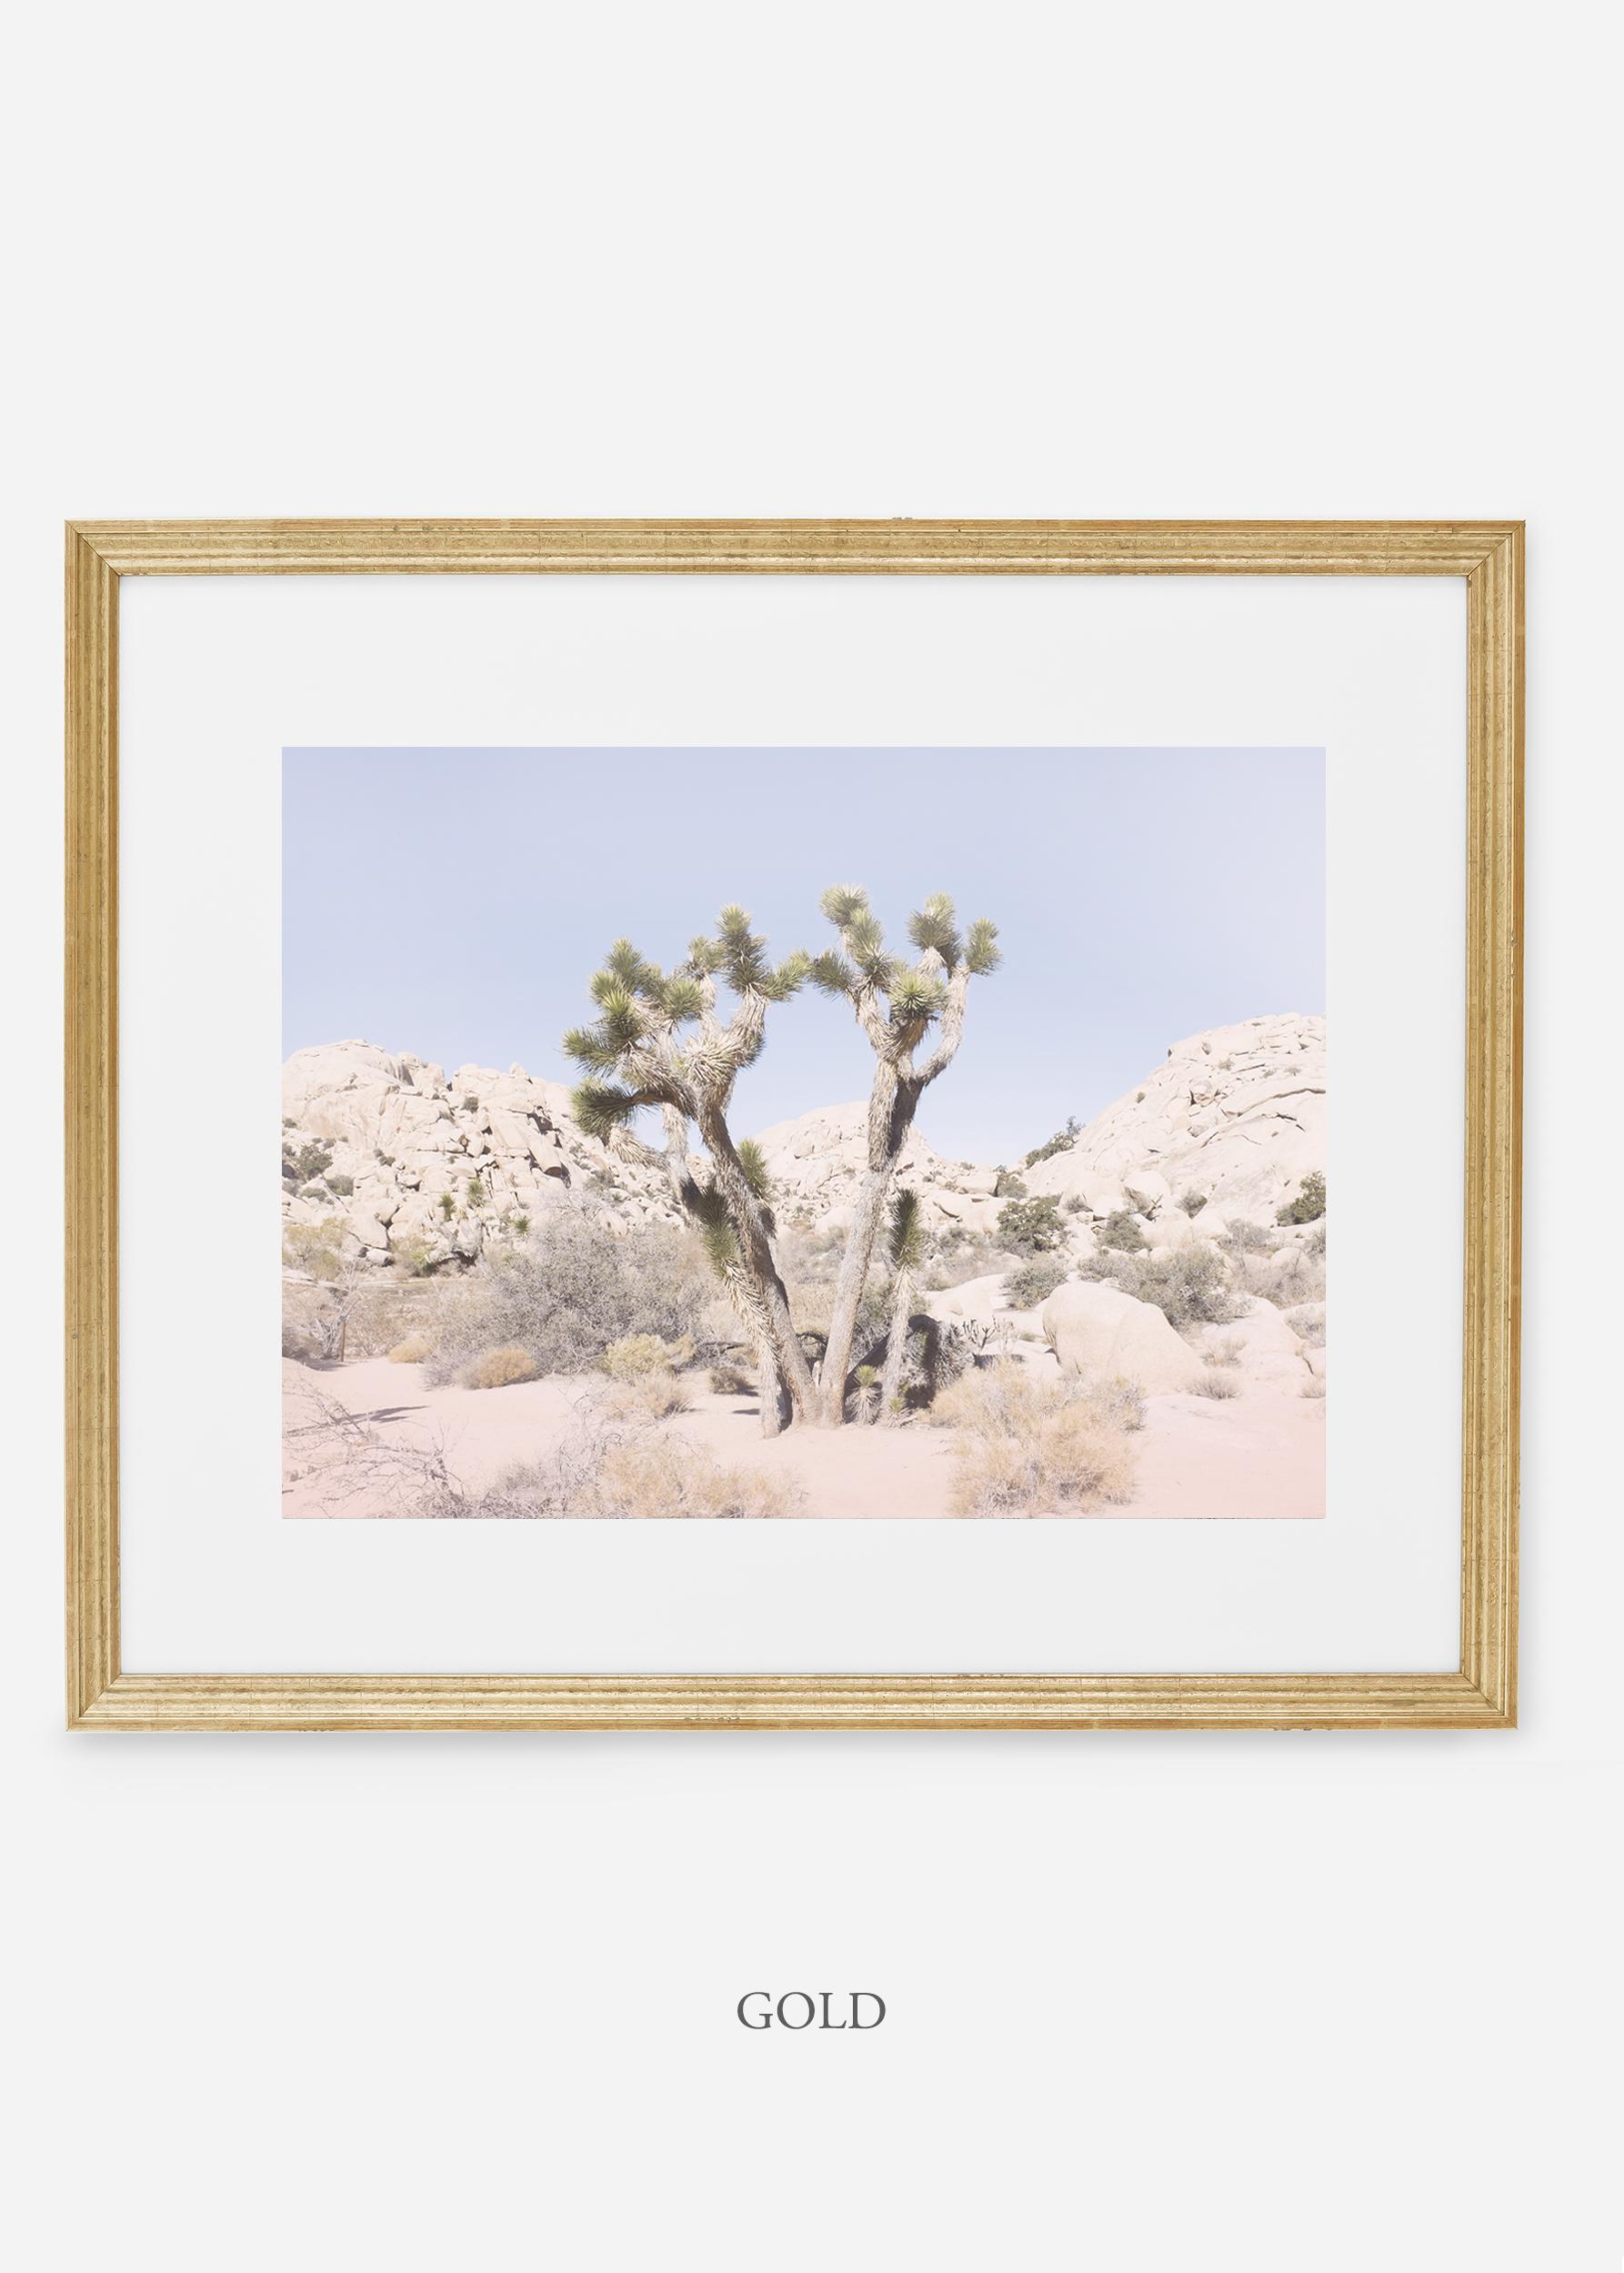 WilderCalifornia_gold_JoshuaTree_No.16_interiordesign_prints_art.jpg